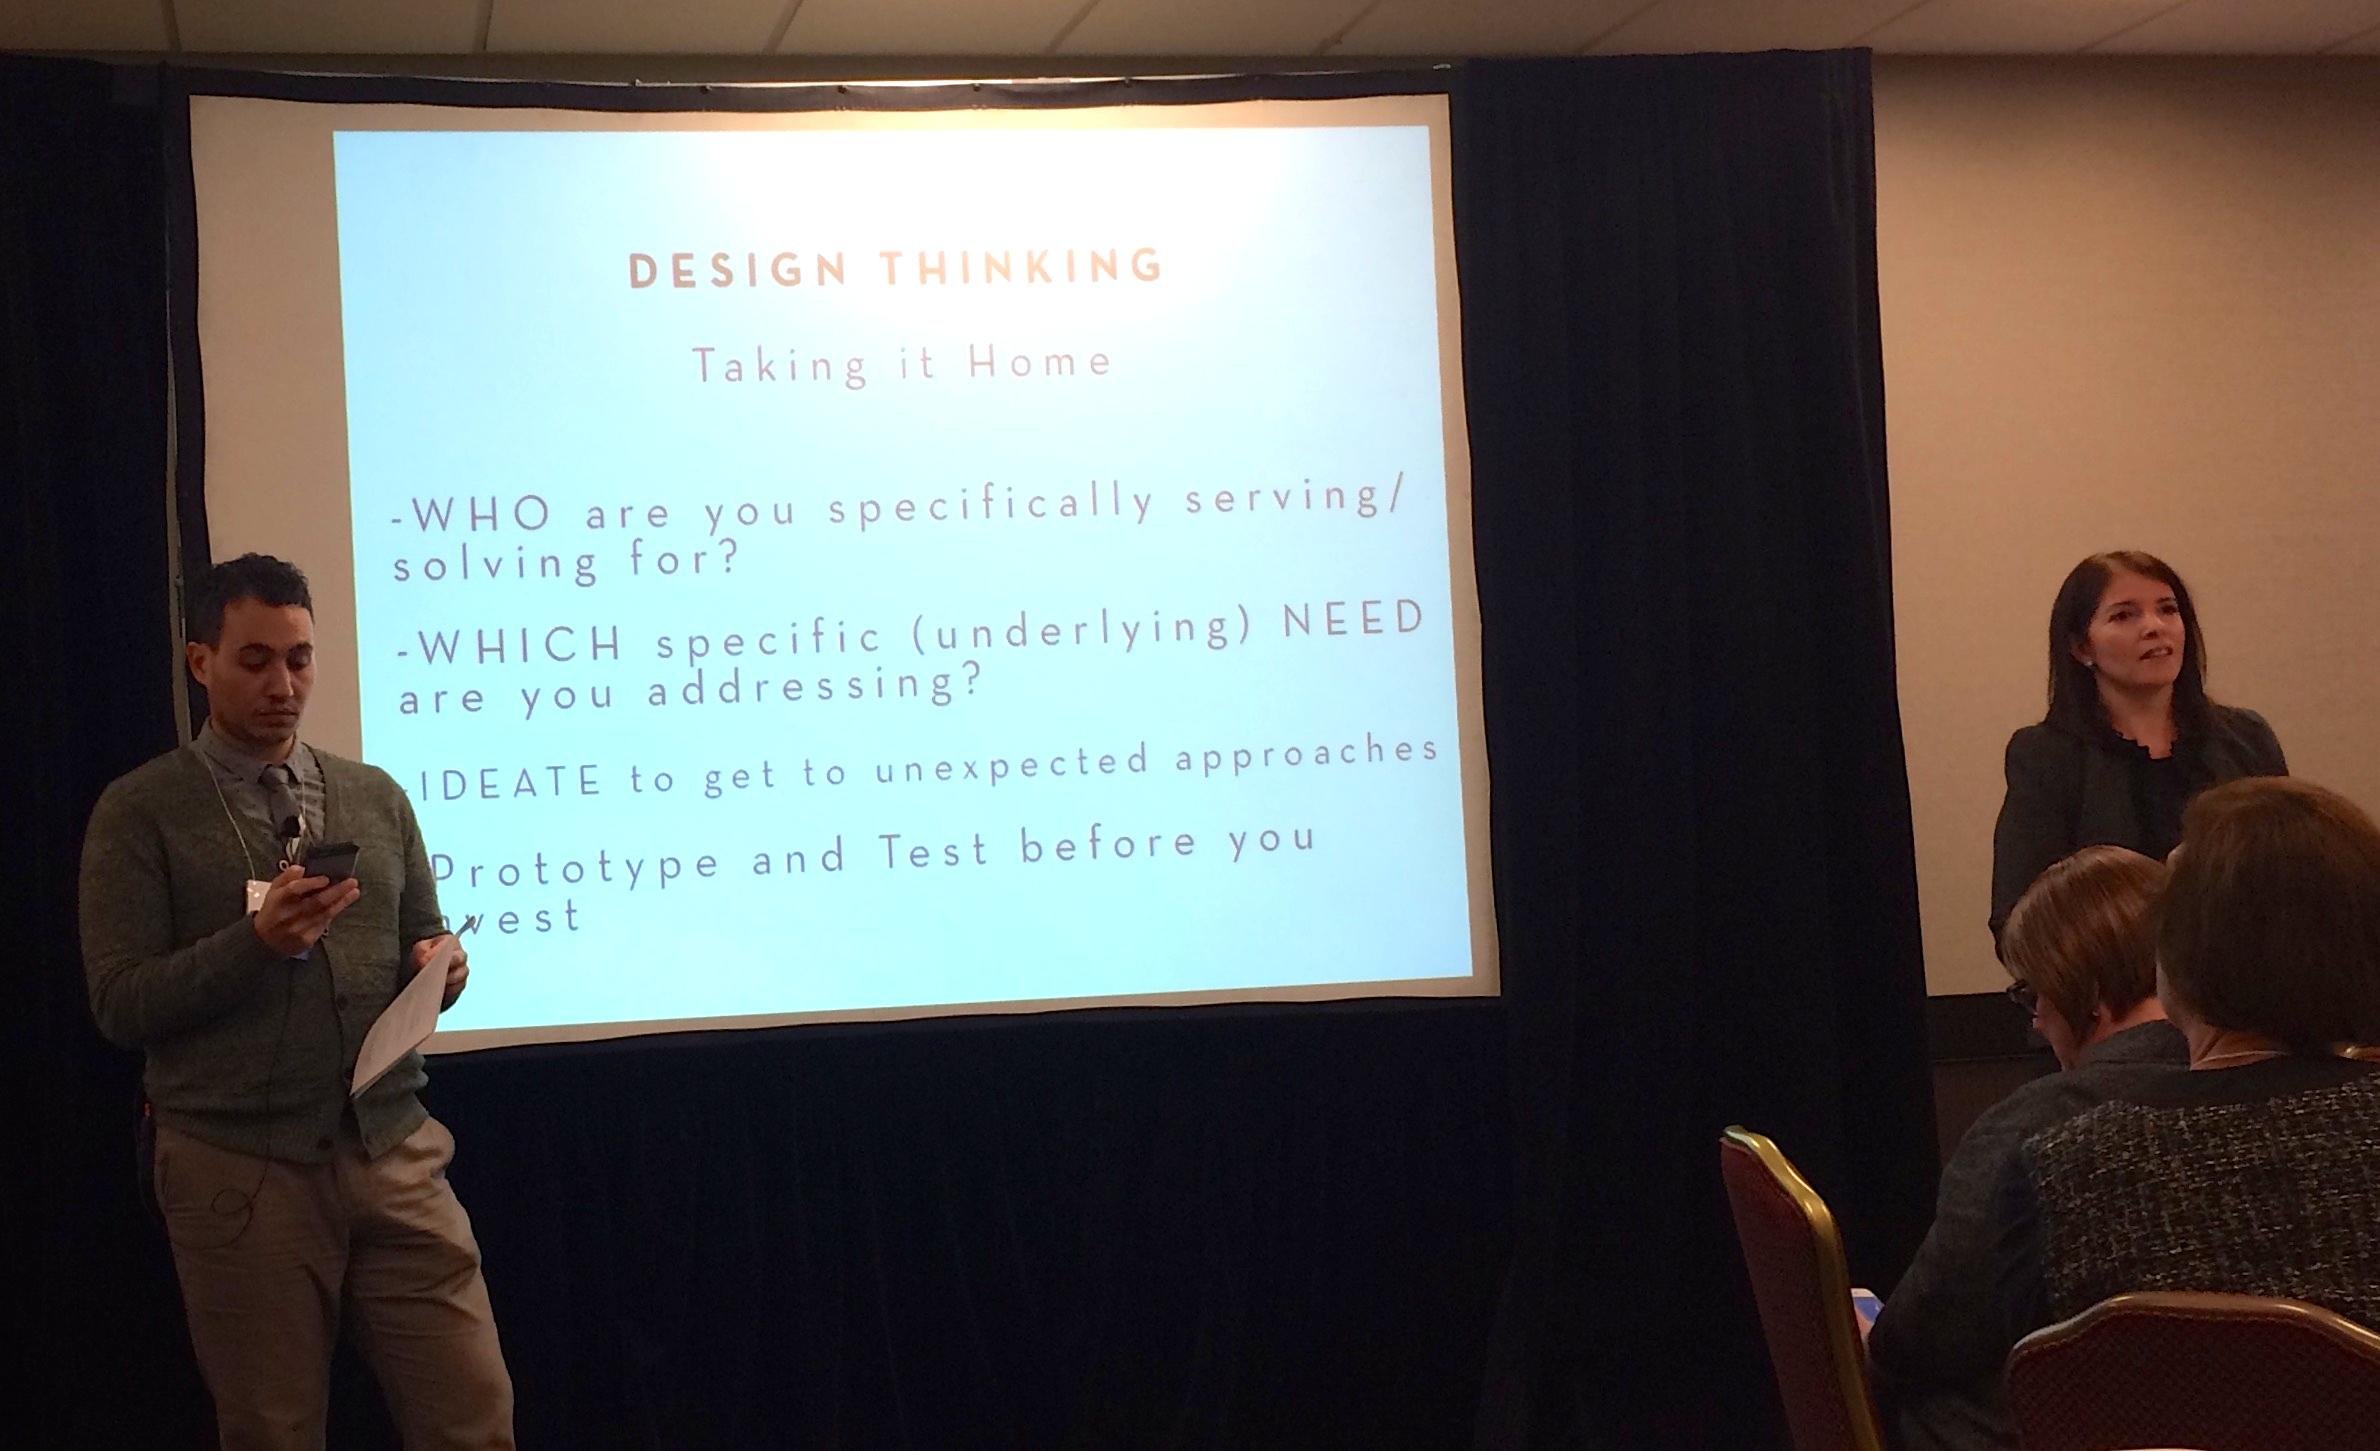 DesignThinking3SS.jpg